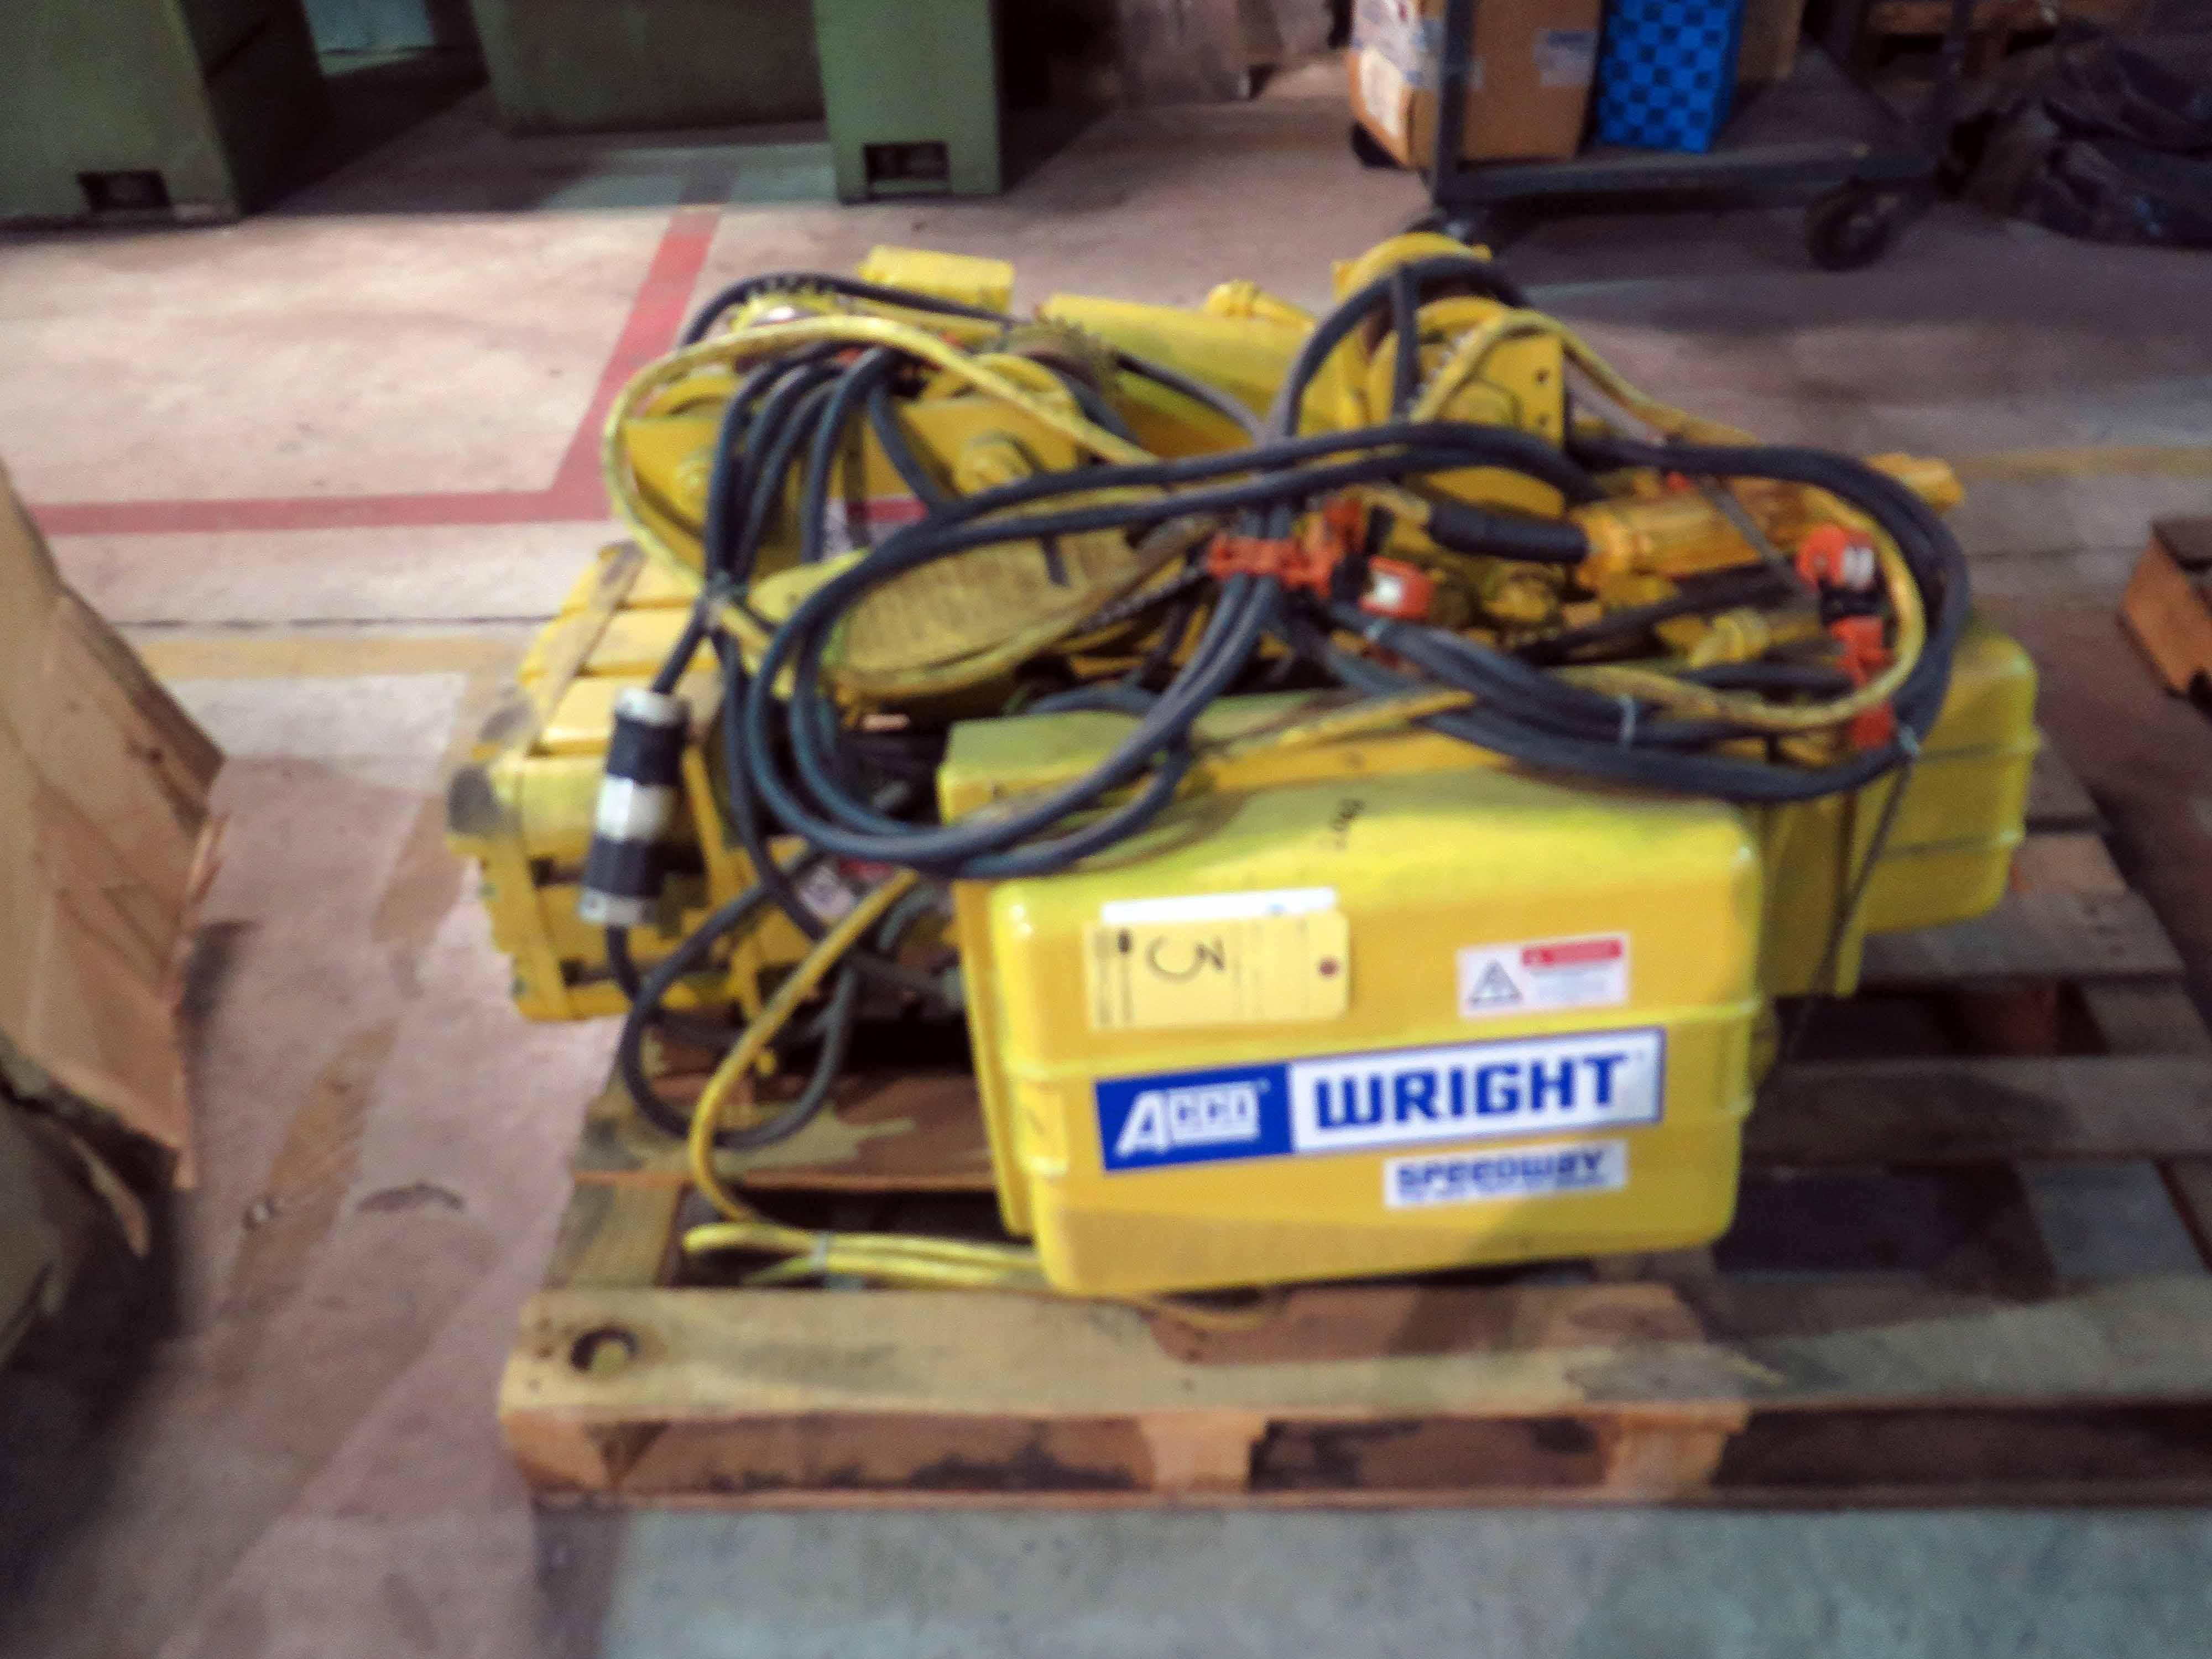 Unitized Hoist Amp Trolley Unit Acco Wright Speedway 3 T Cap Wiring Diagram Lot